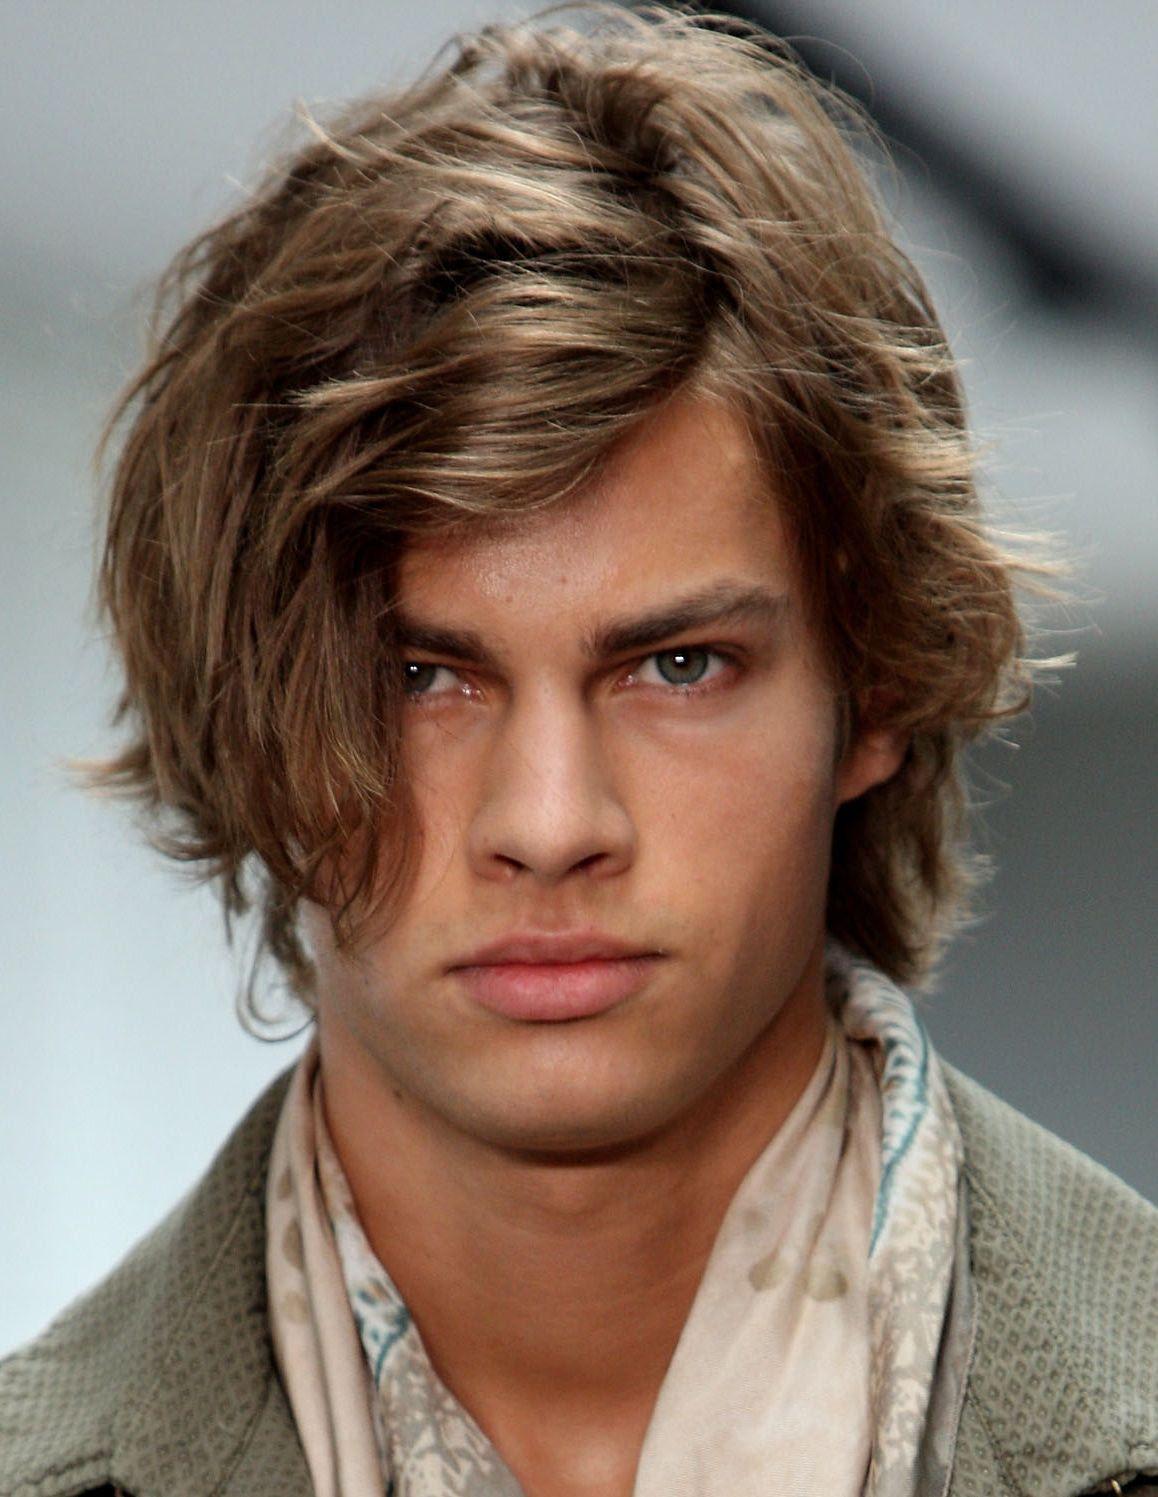 Awe Inspiring 1000 Images About Mens Medium Hair On Pinterest Mens Medium Short Hairstyles Gunalazisus